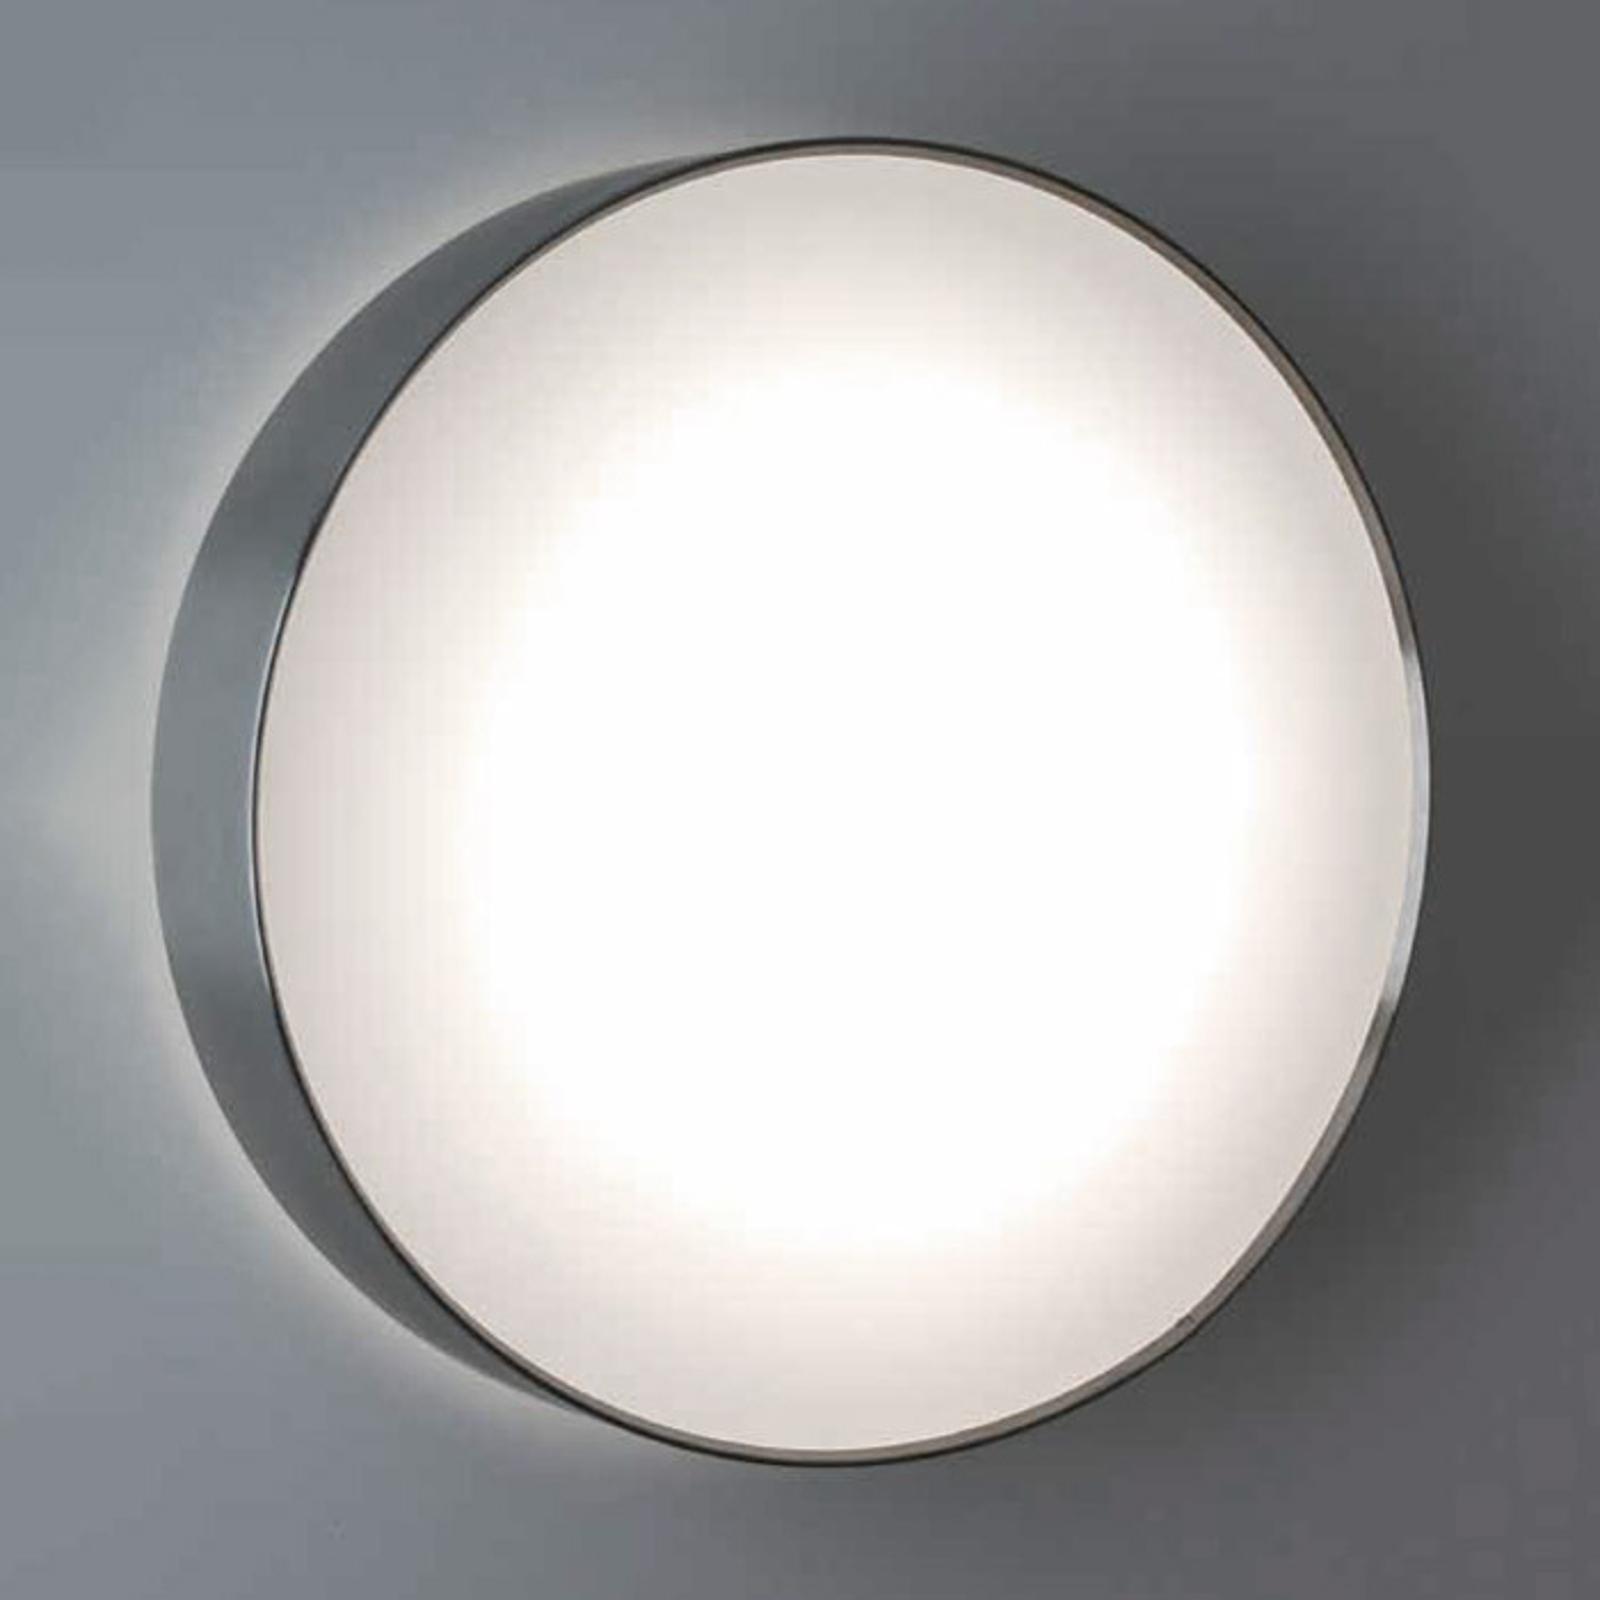 SUN 4 LED stainless steel wall light_1018250_1